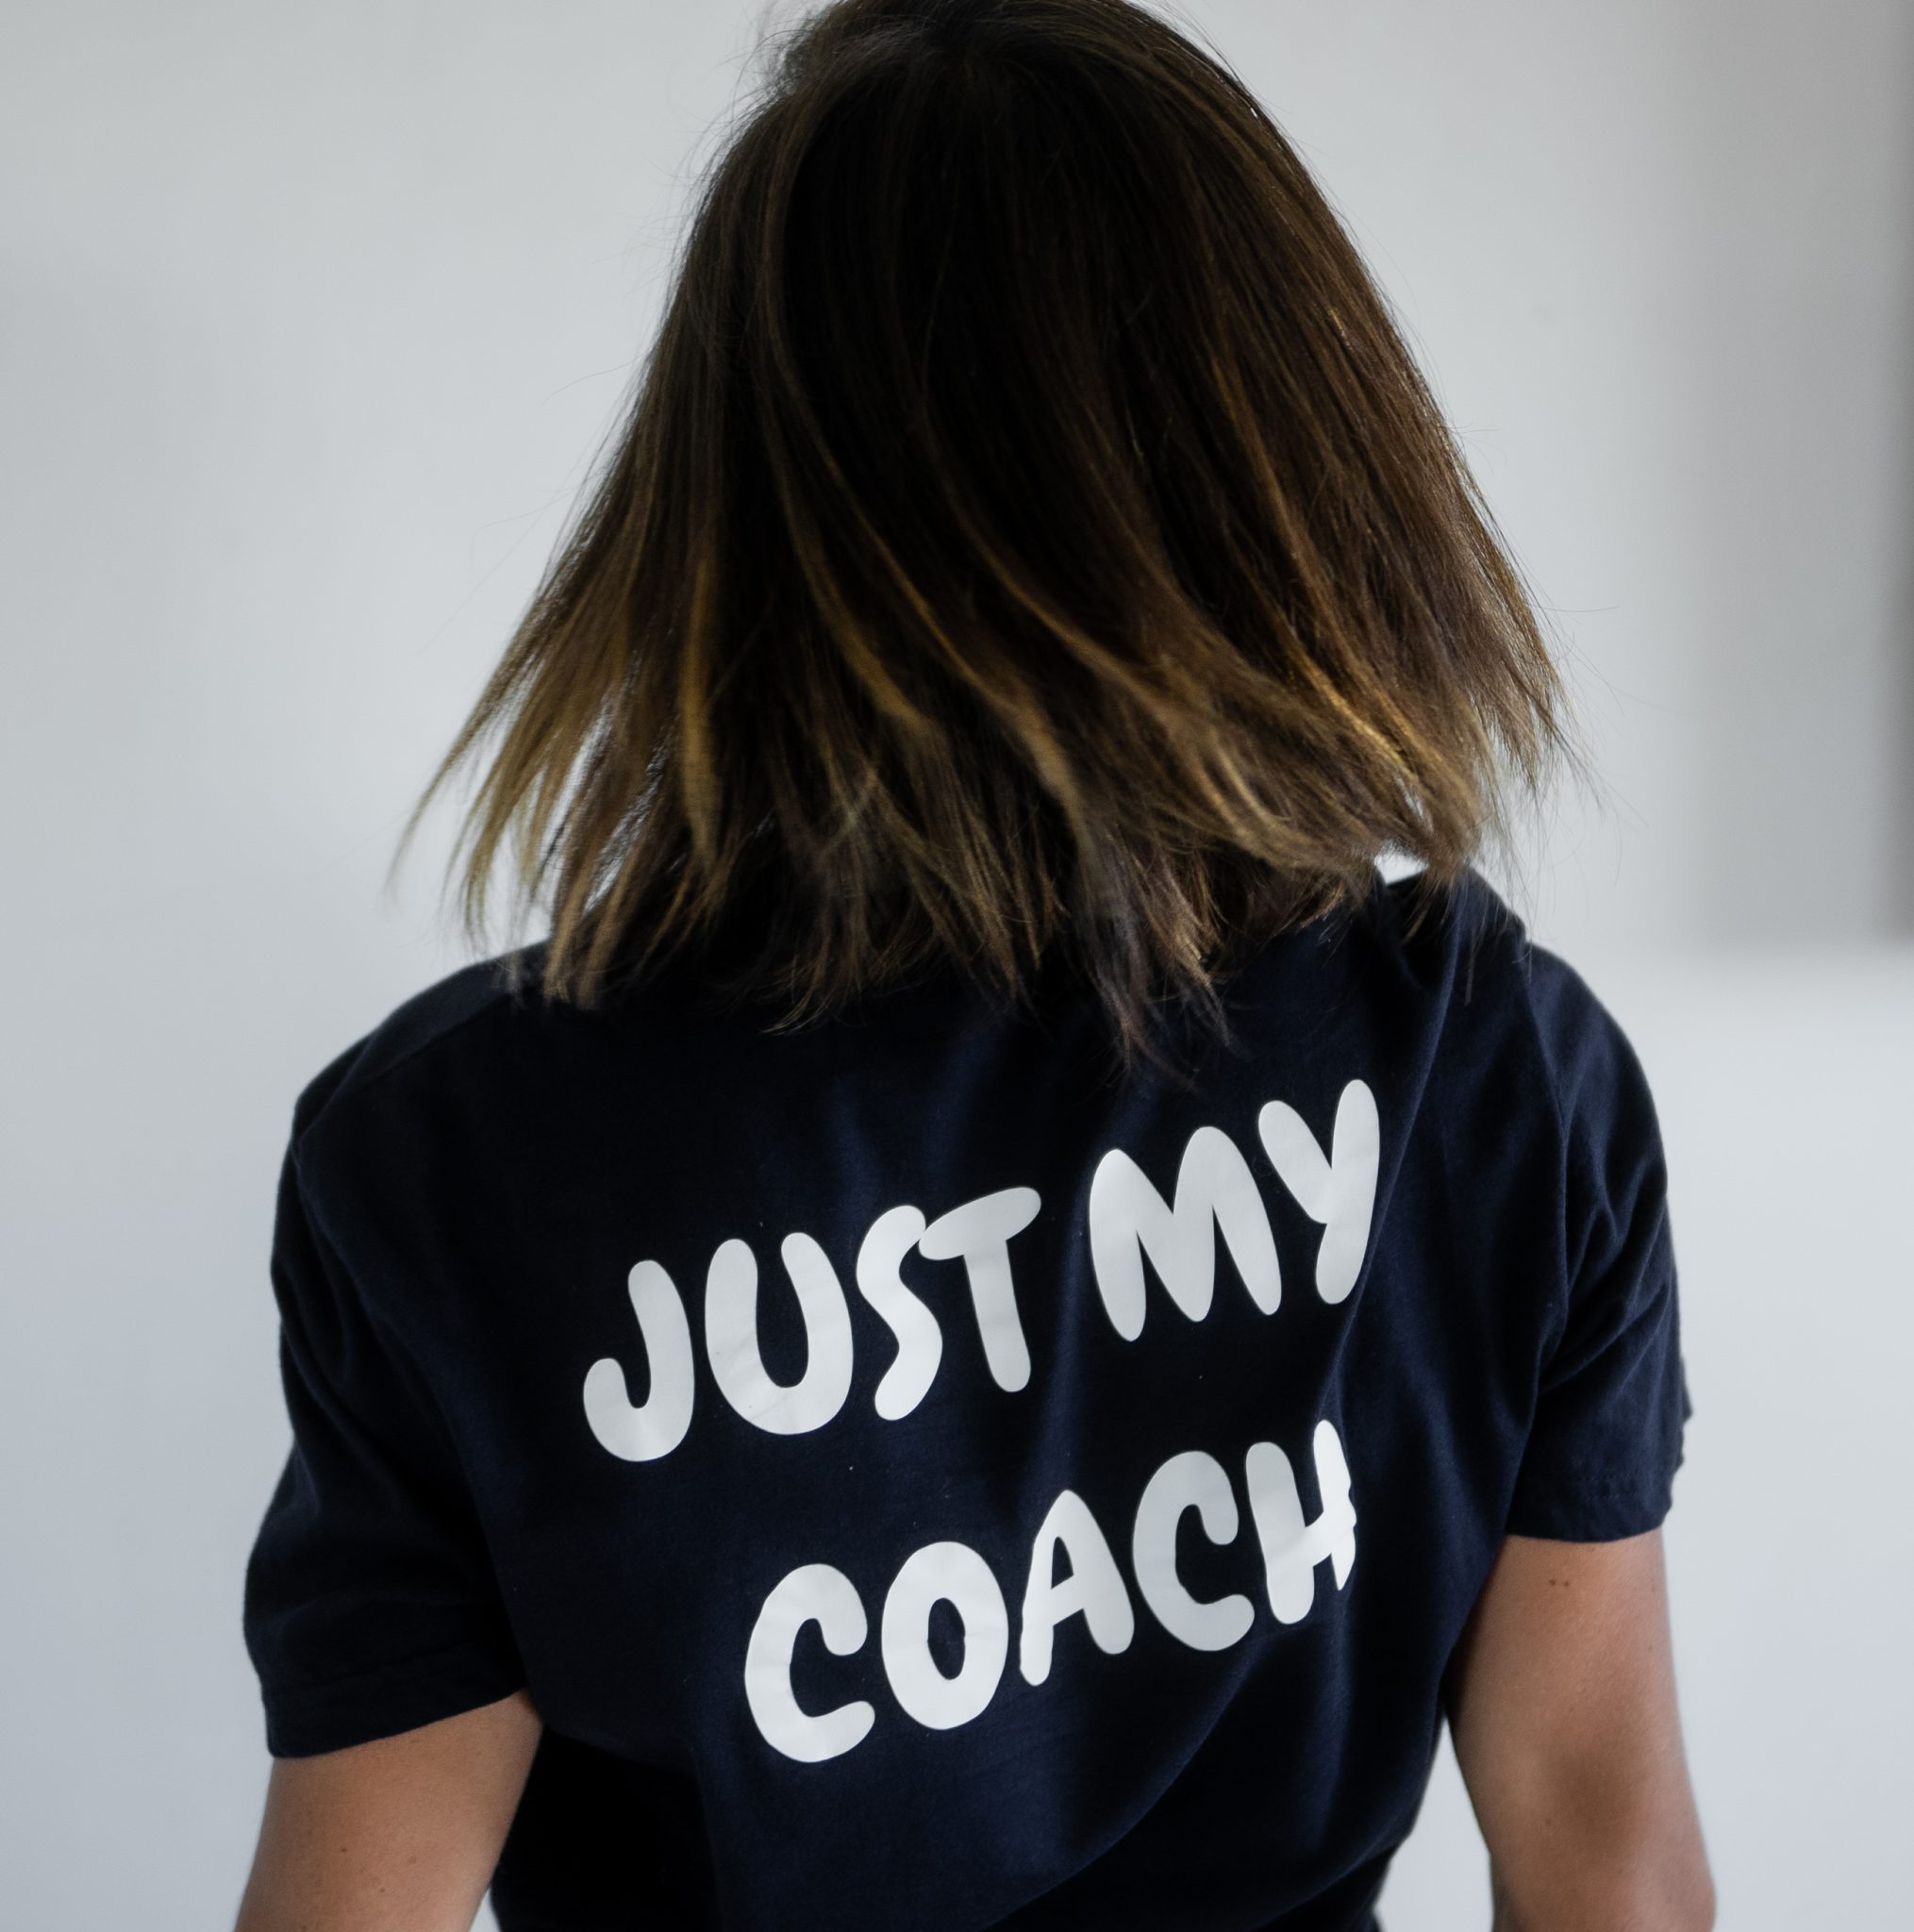 coach sportif annemasse